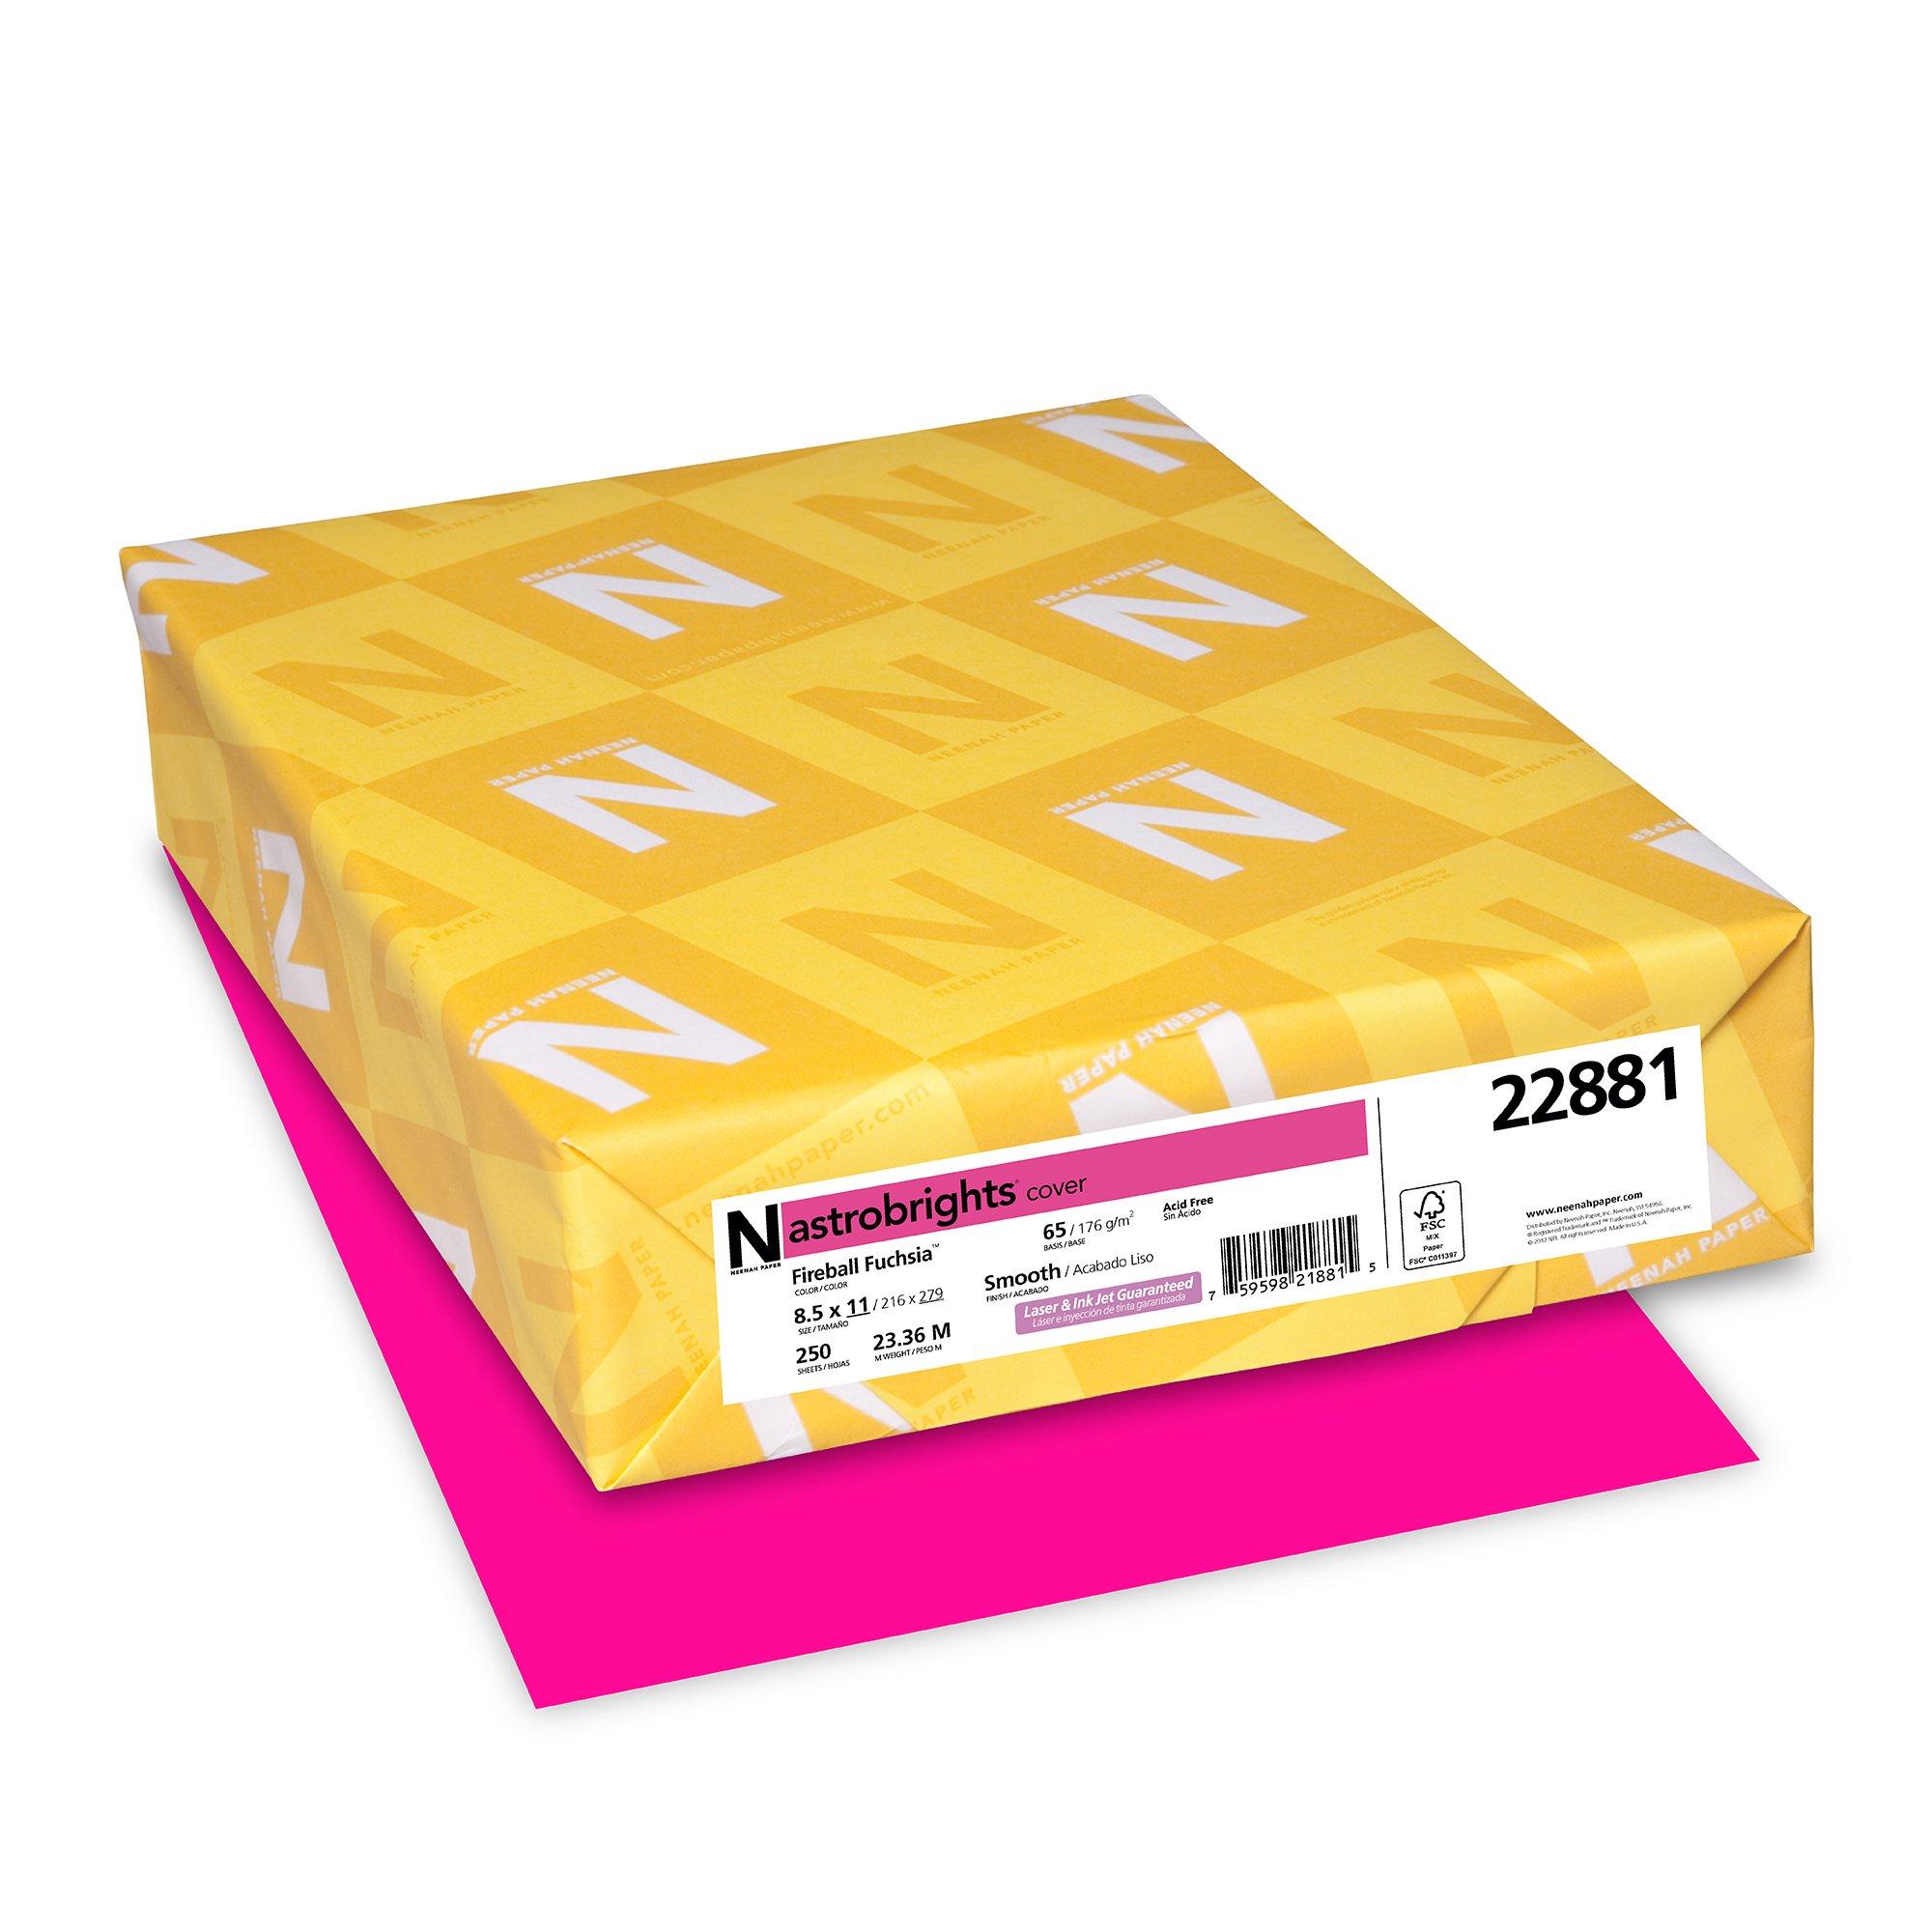 Wausau Astrobrights Cardstock, 65 lb, 8.5 x 11 Inches, Fireball Fuchsia, 250 Sheets (22881)